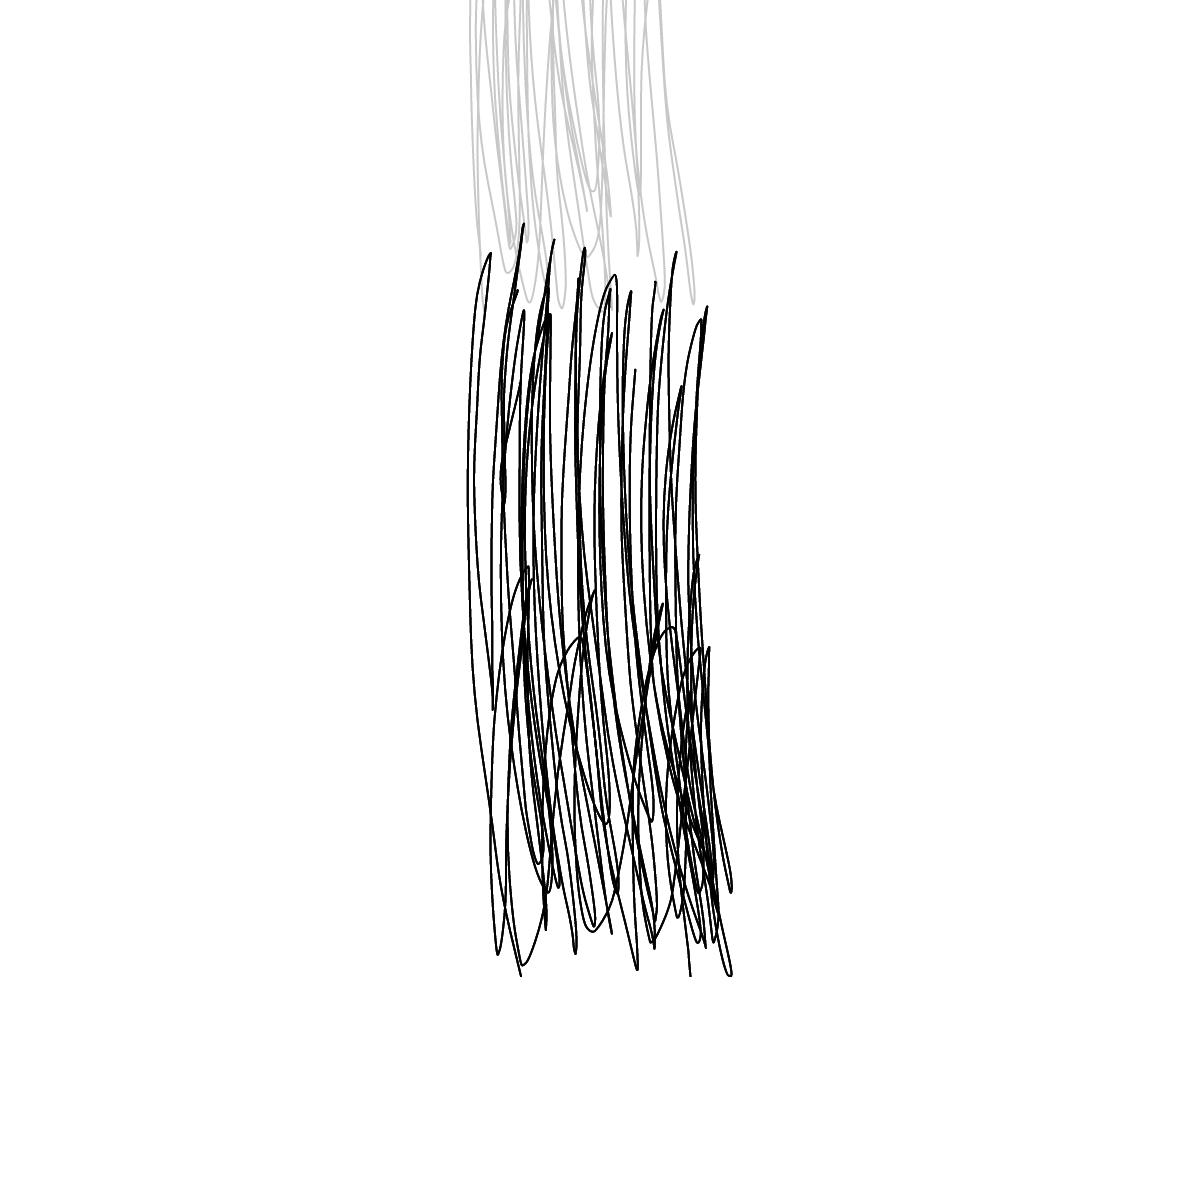 BAAAM drawing#23540 lat:65.0164489746093800lng: -158.3016510009765600